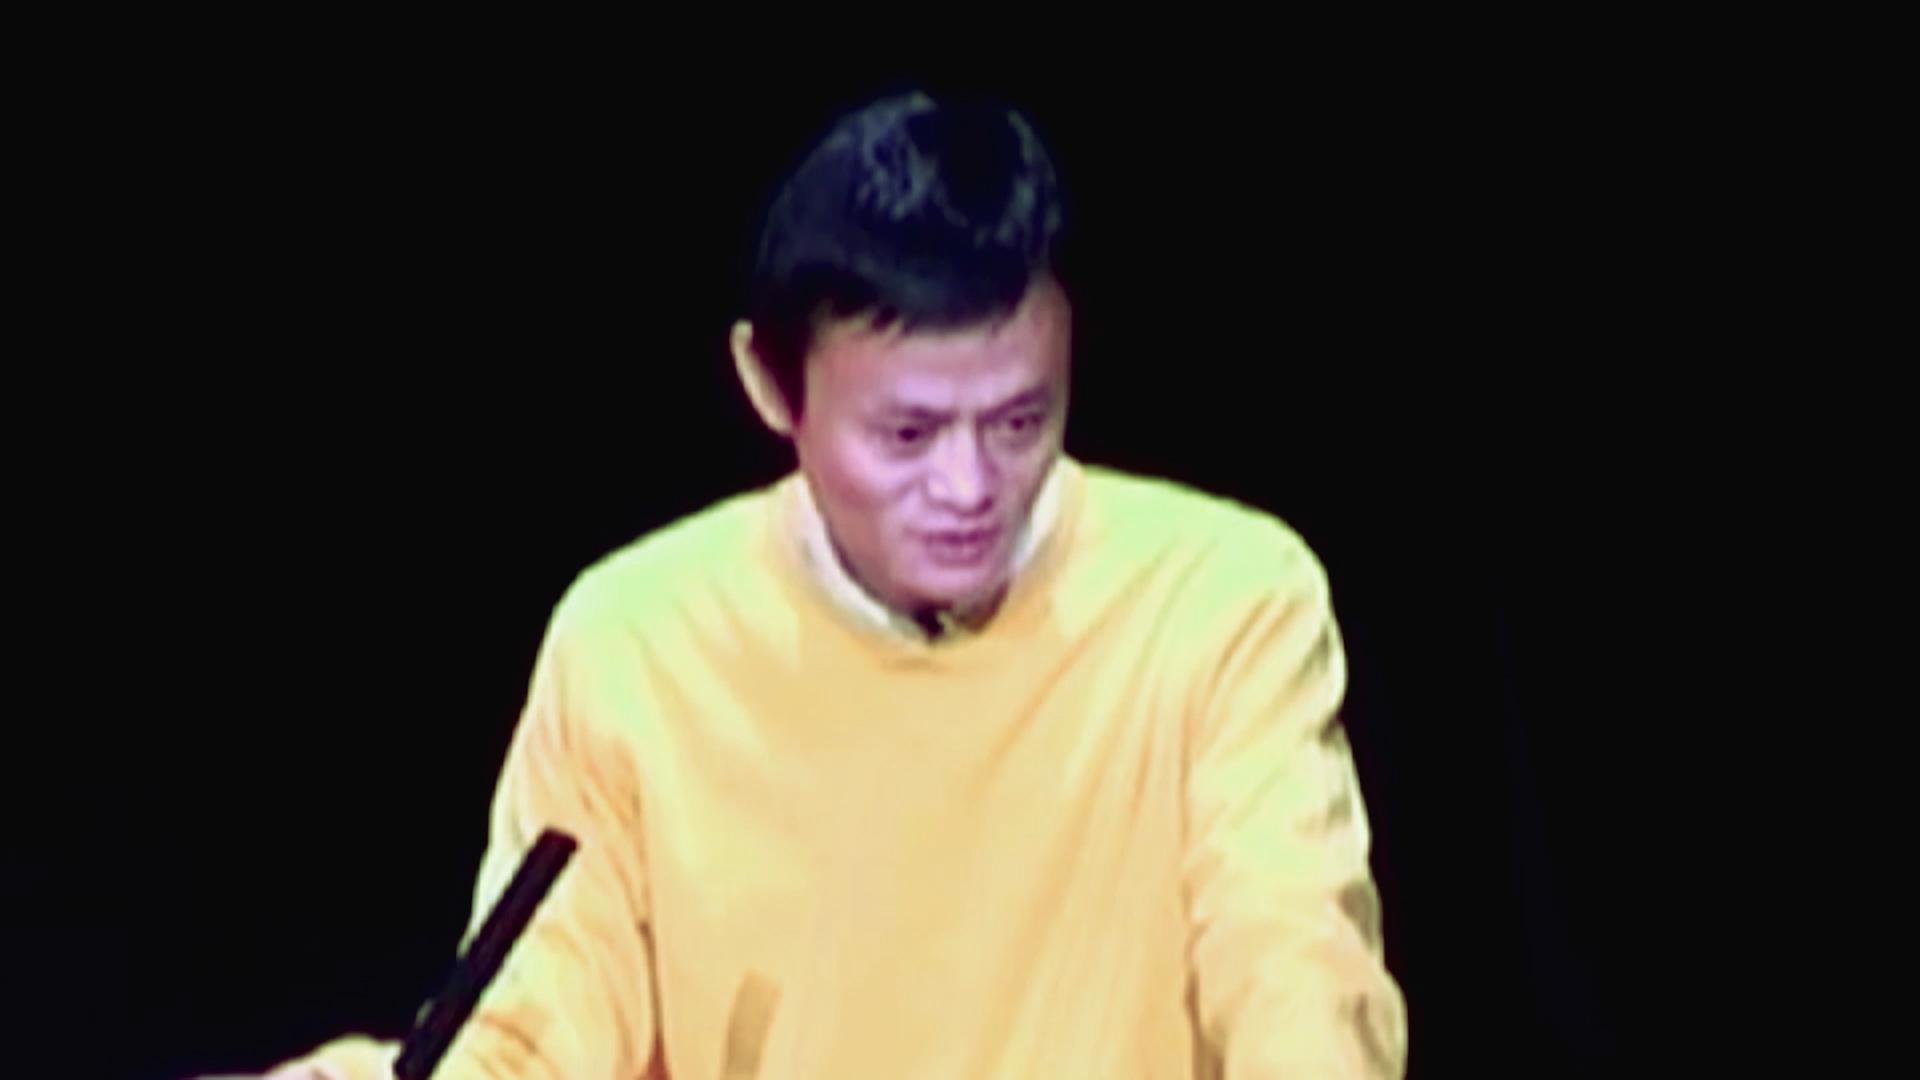 Alibaba S Jack Ma On E Commerce In China Globalization And Trump